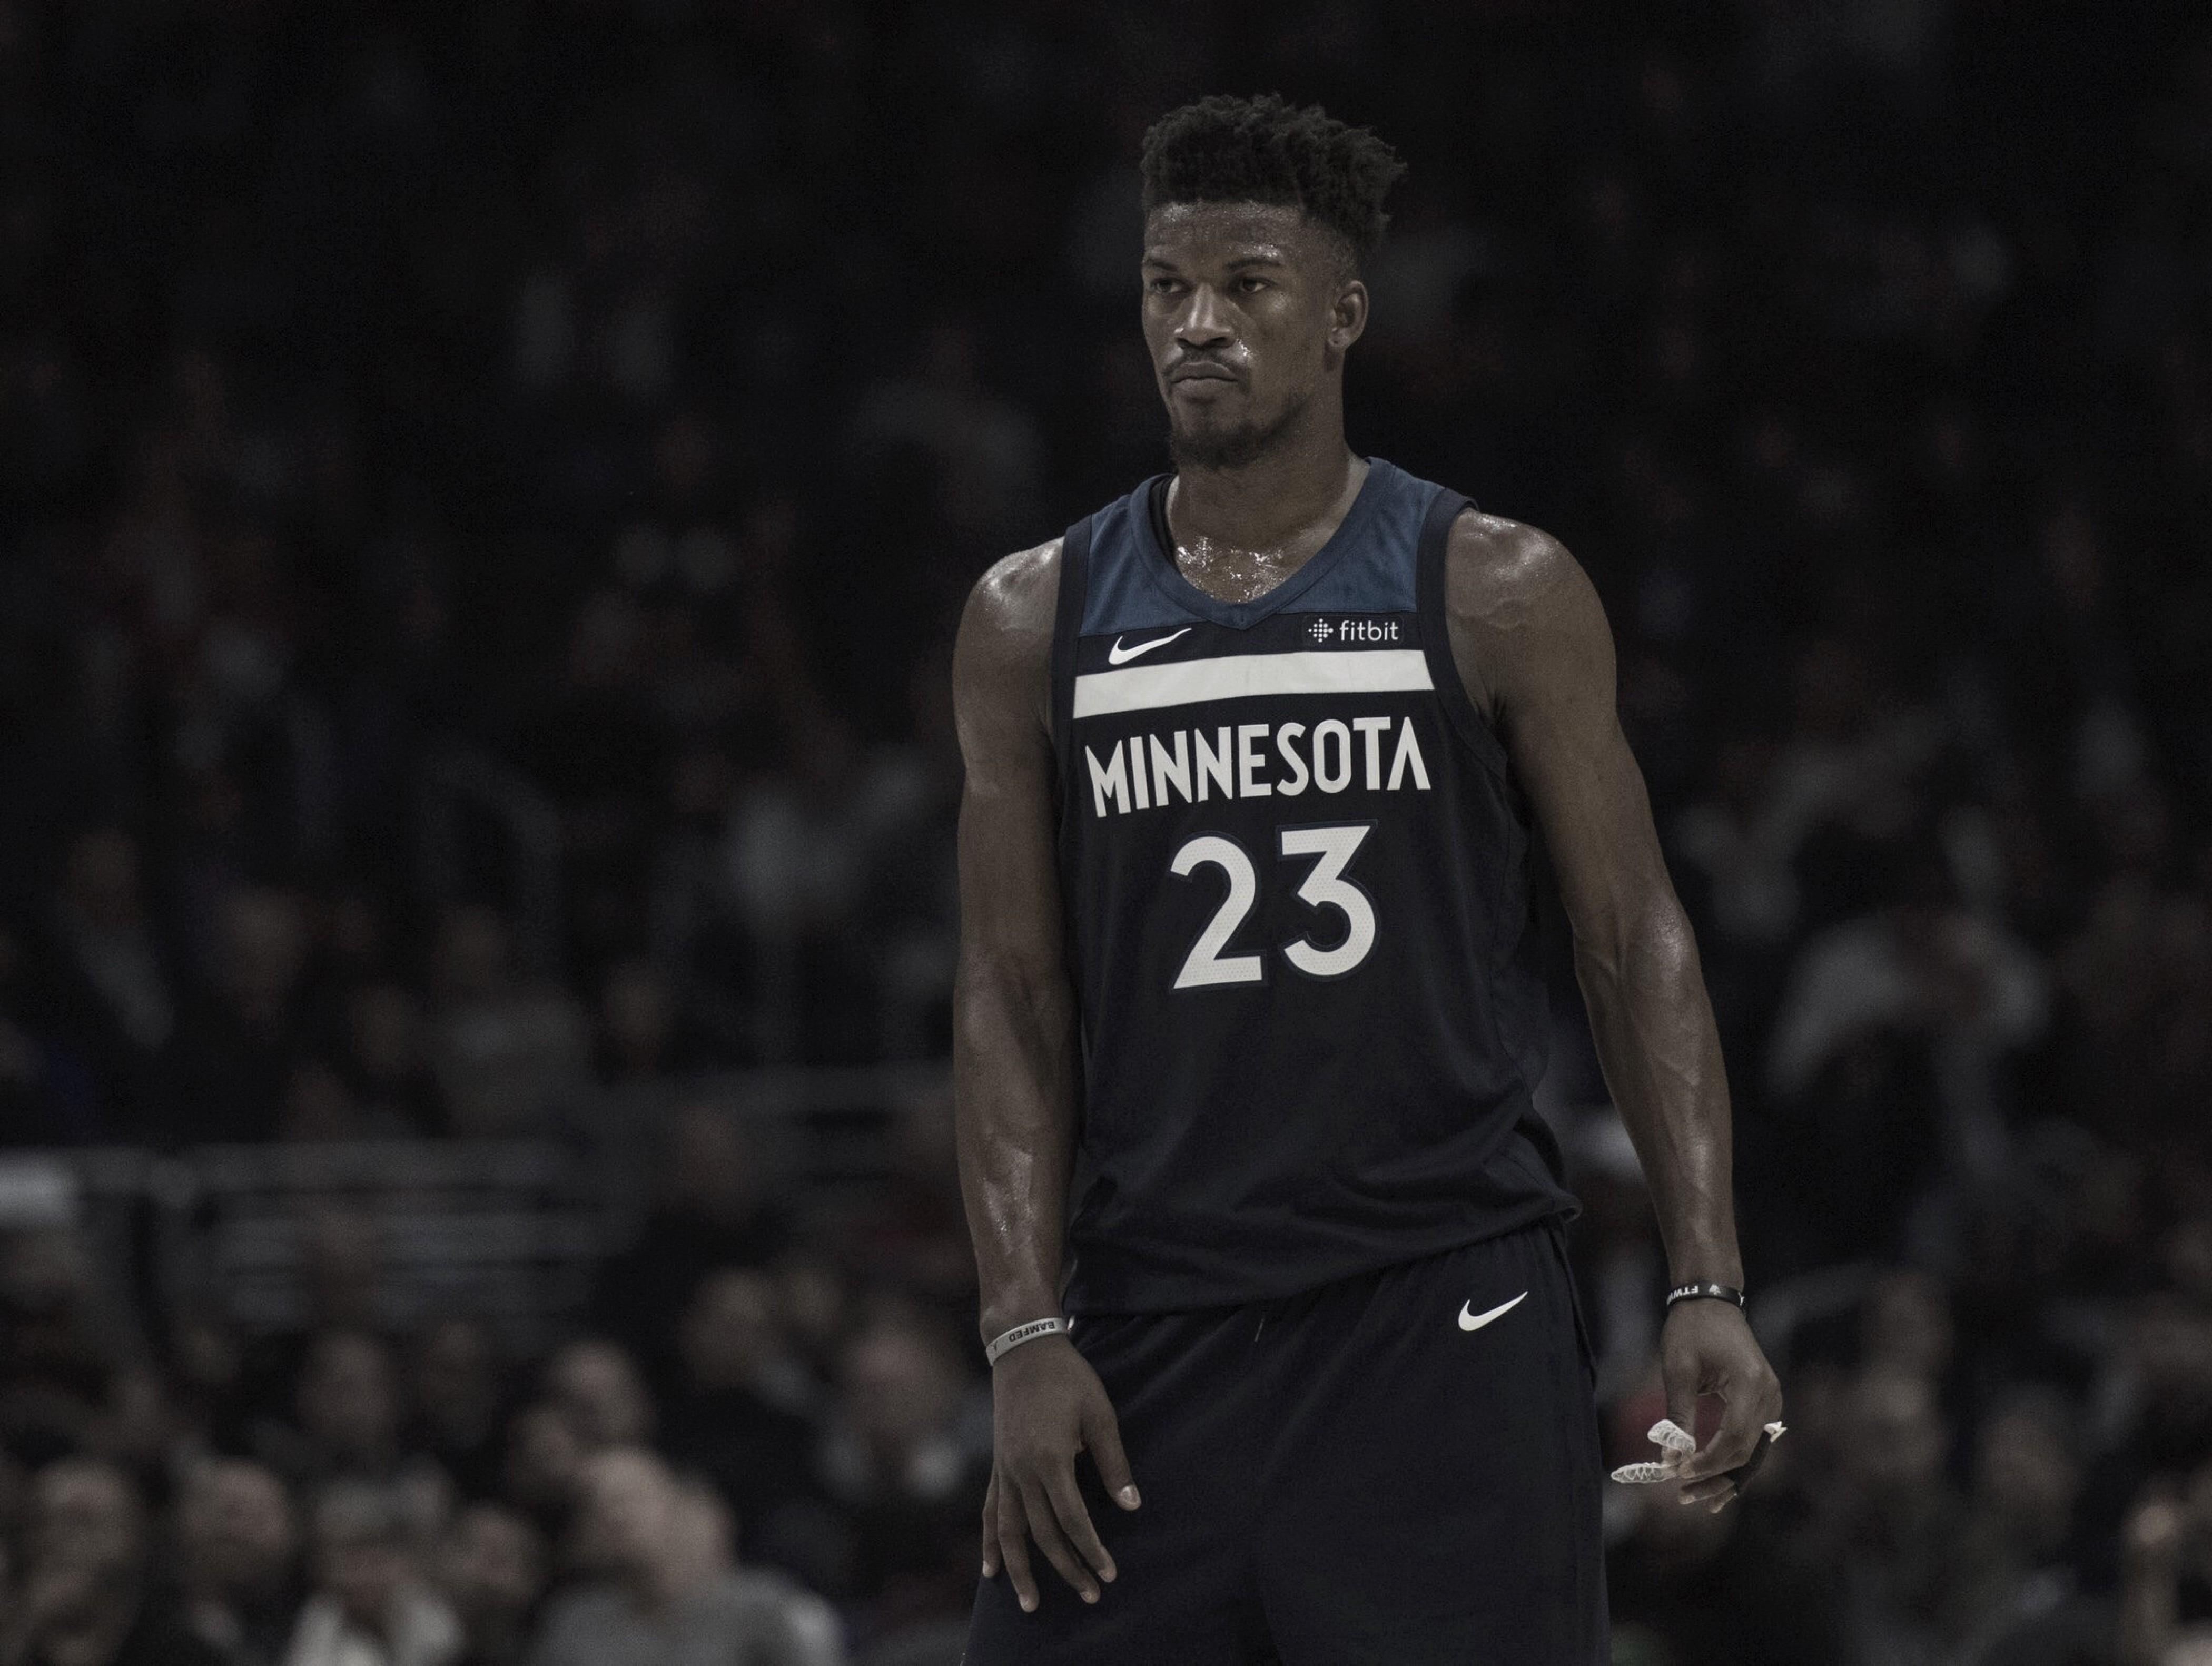 Butler no desea continuar con los Timberwolves